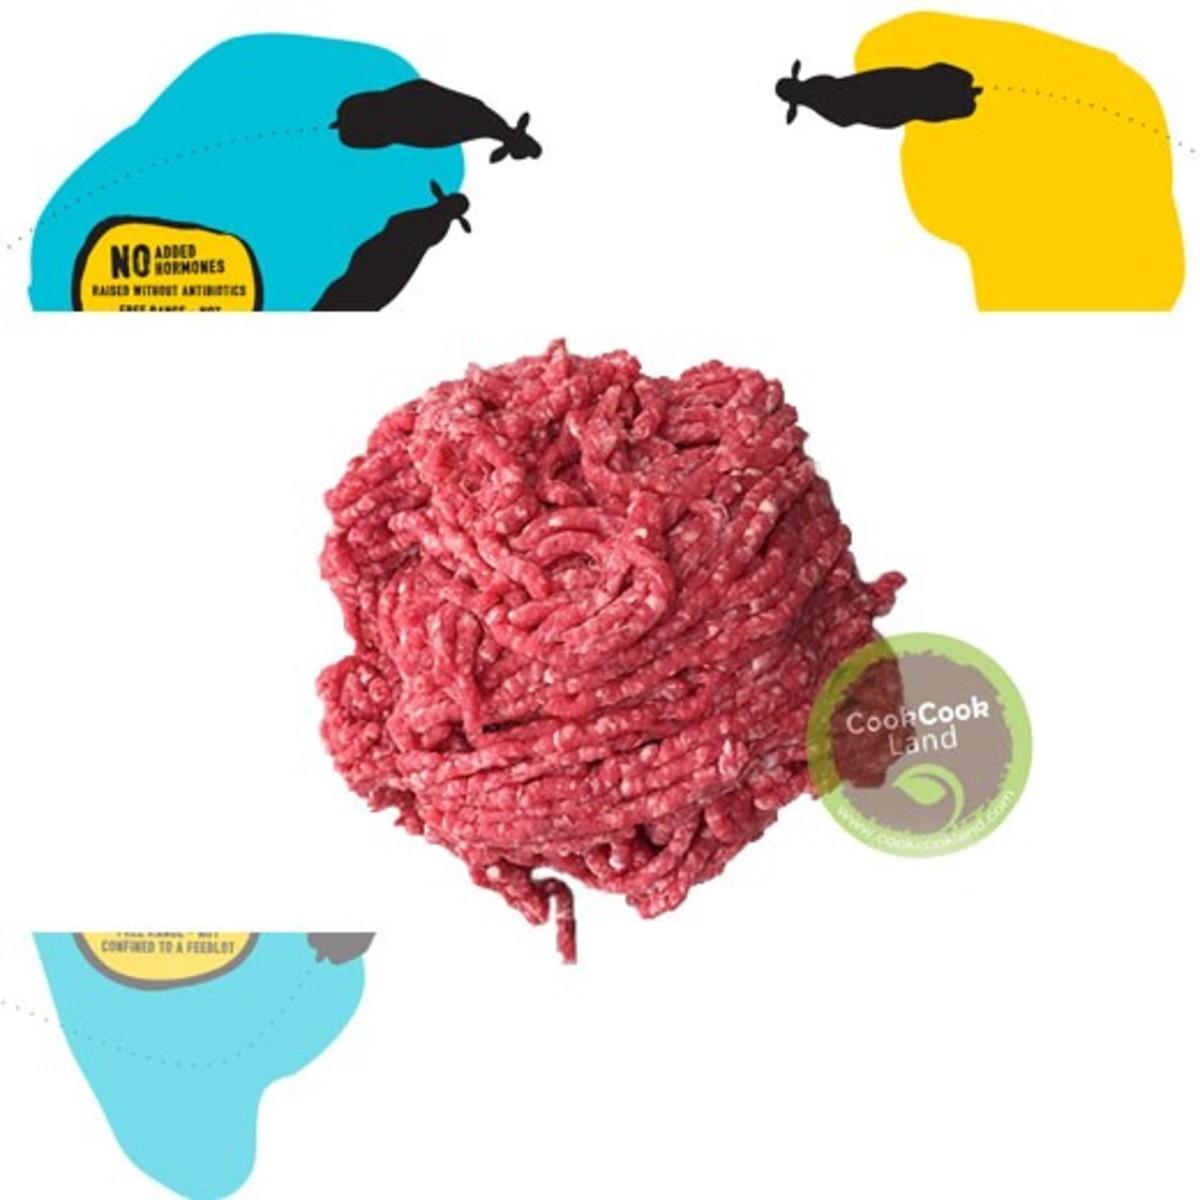 Australia Organic Grass-fed Minced Beef  500g